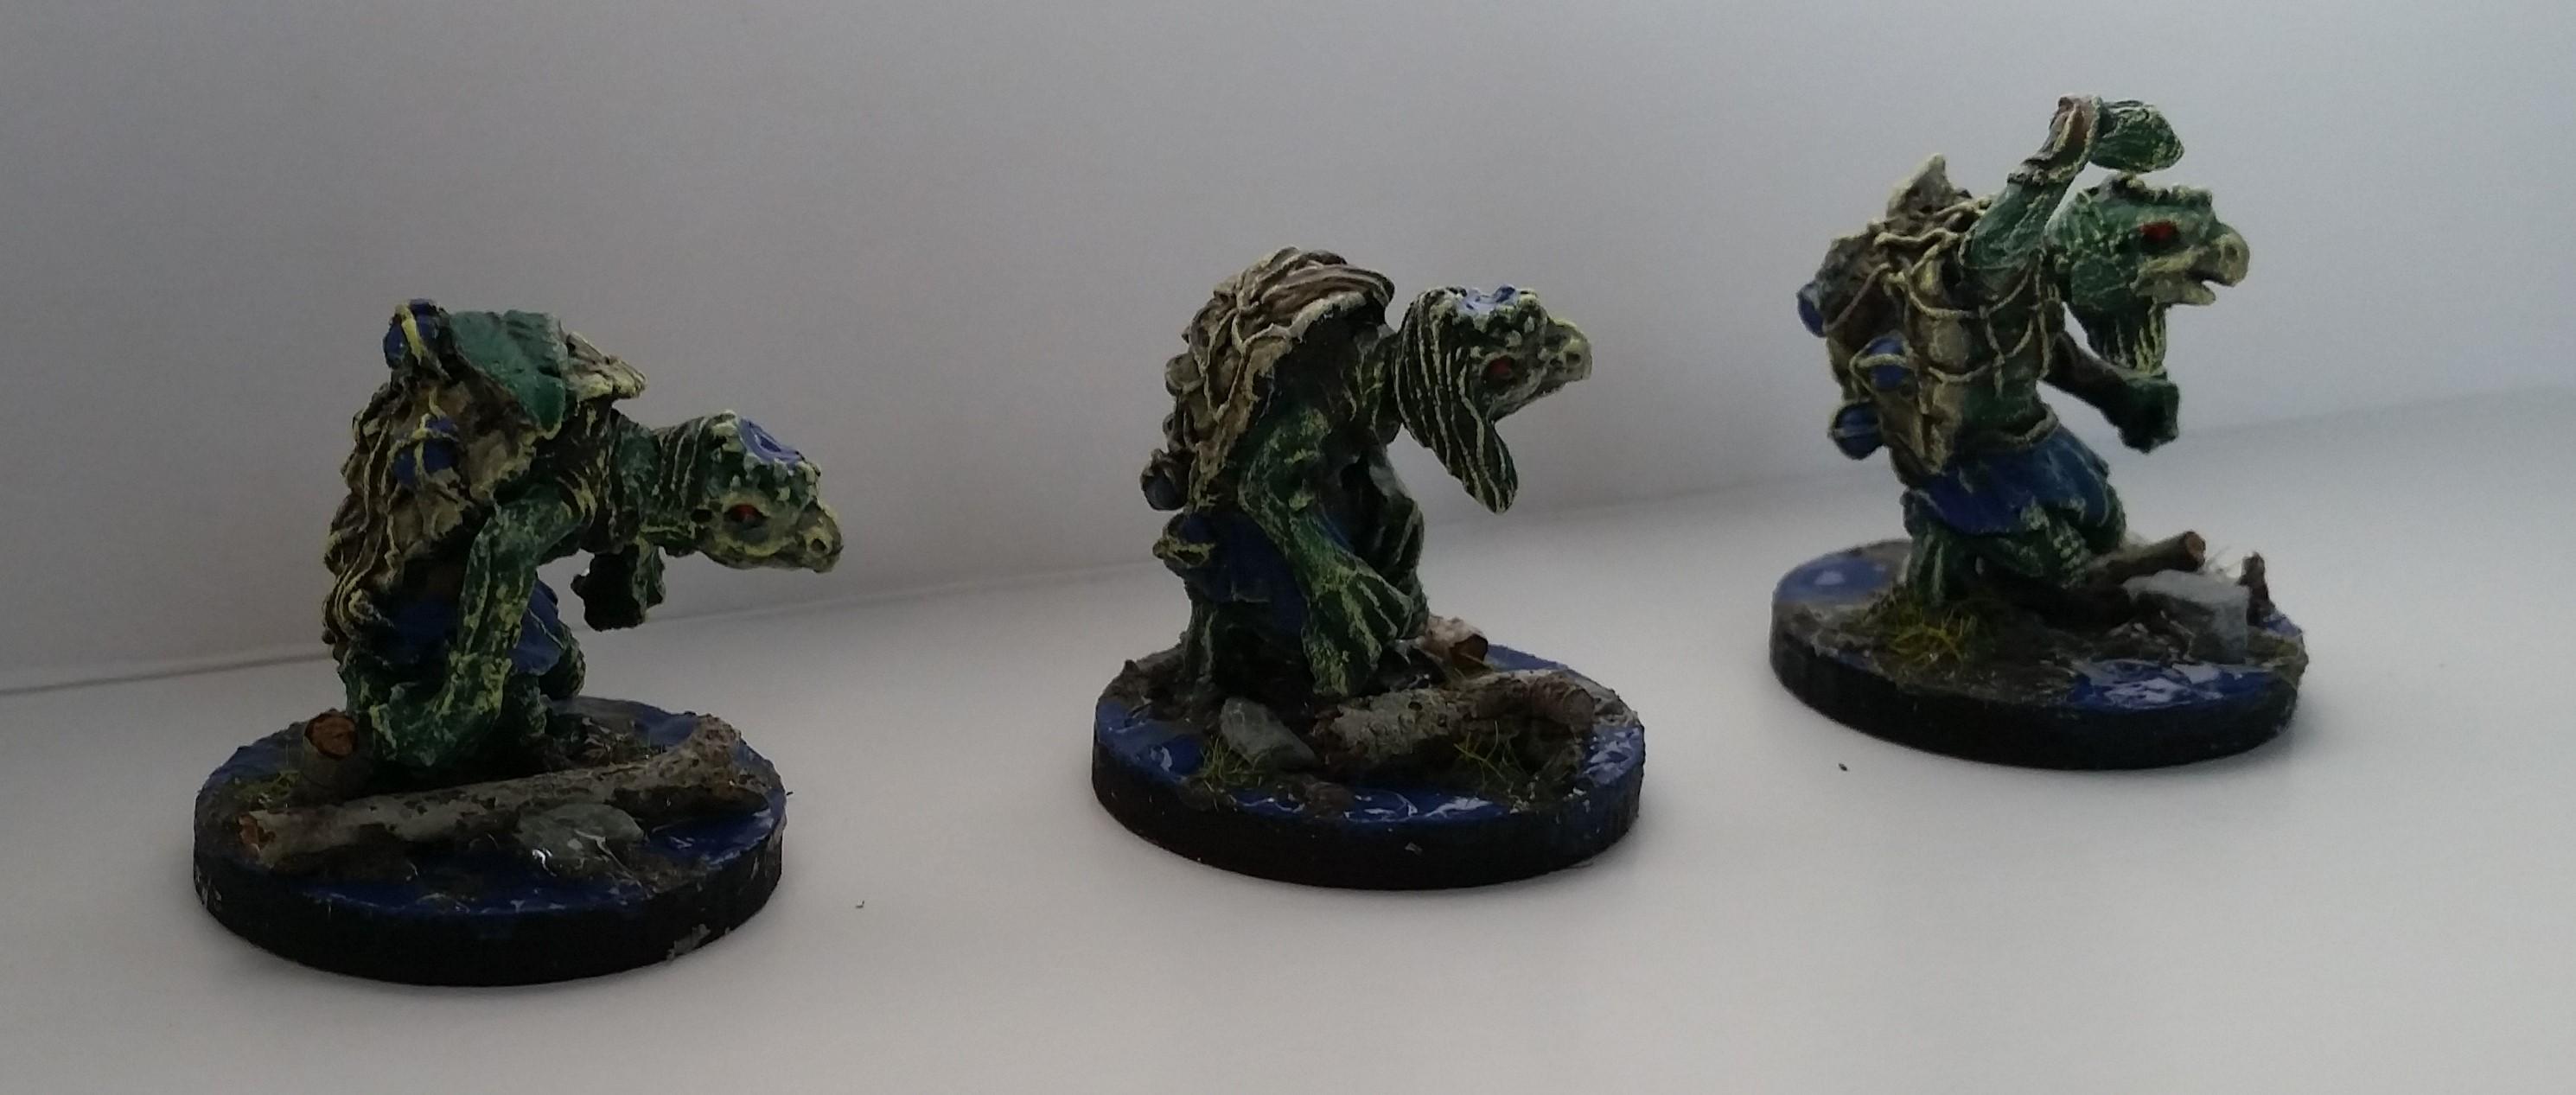 Daemons, Kappa, Ronin, Water